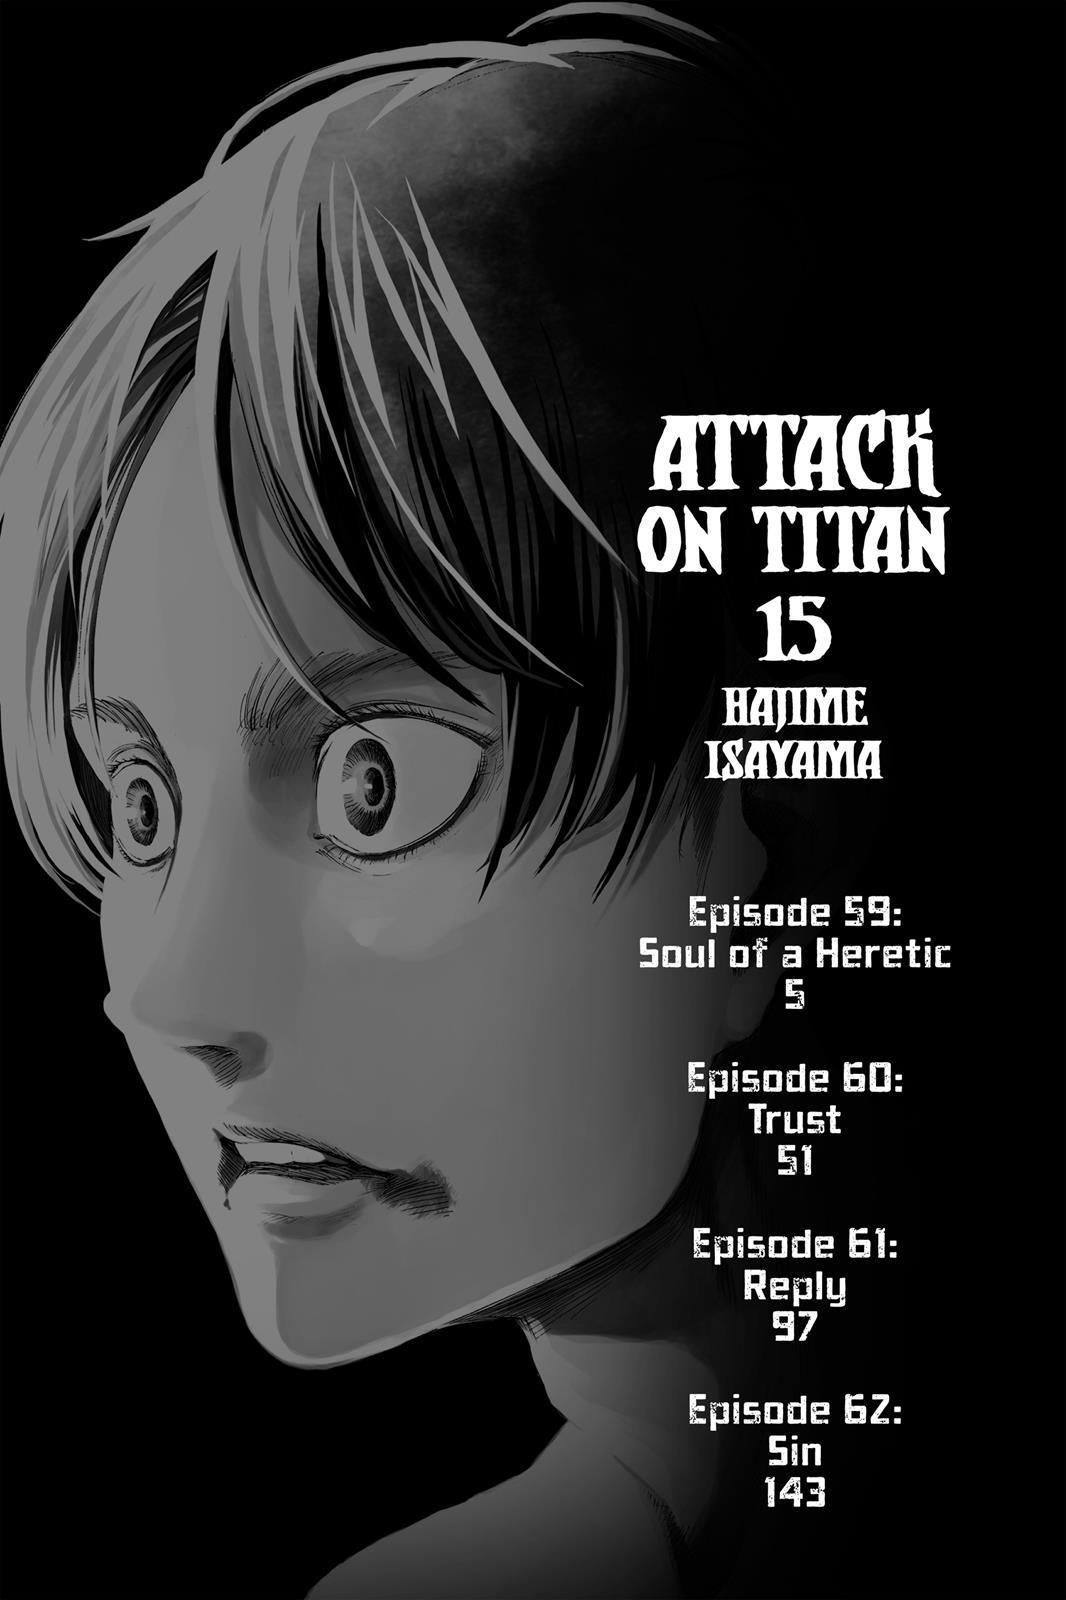 Attack On Titan, Episode 59 image 003